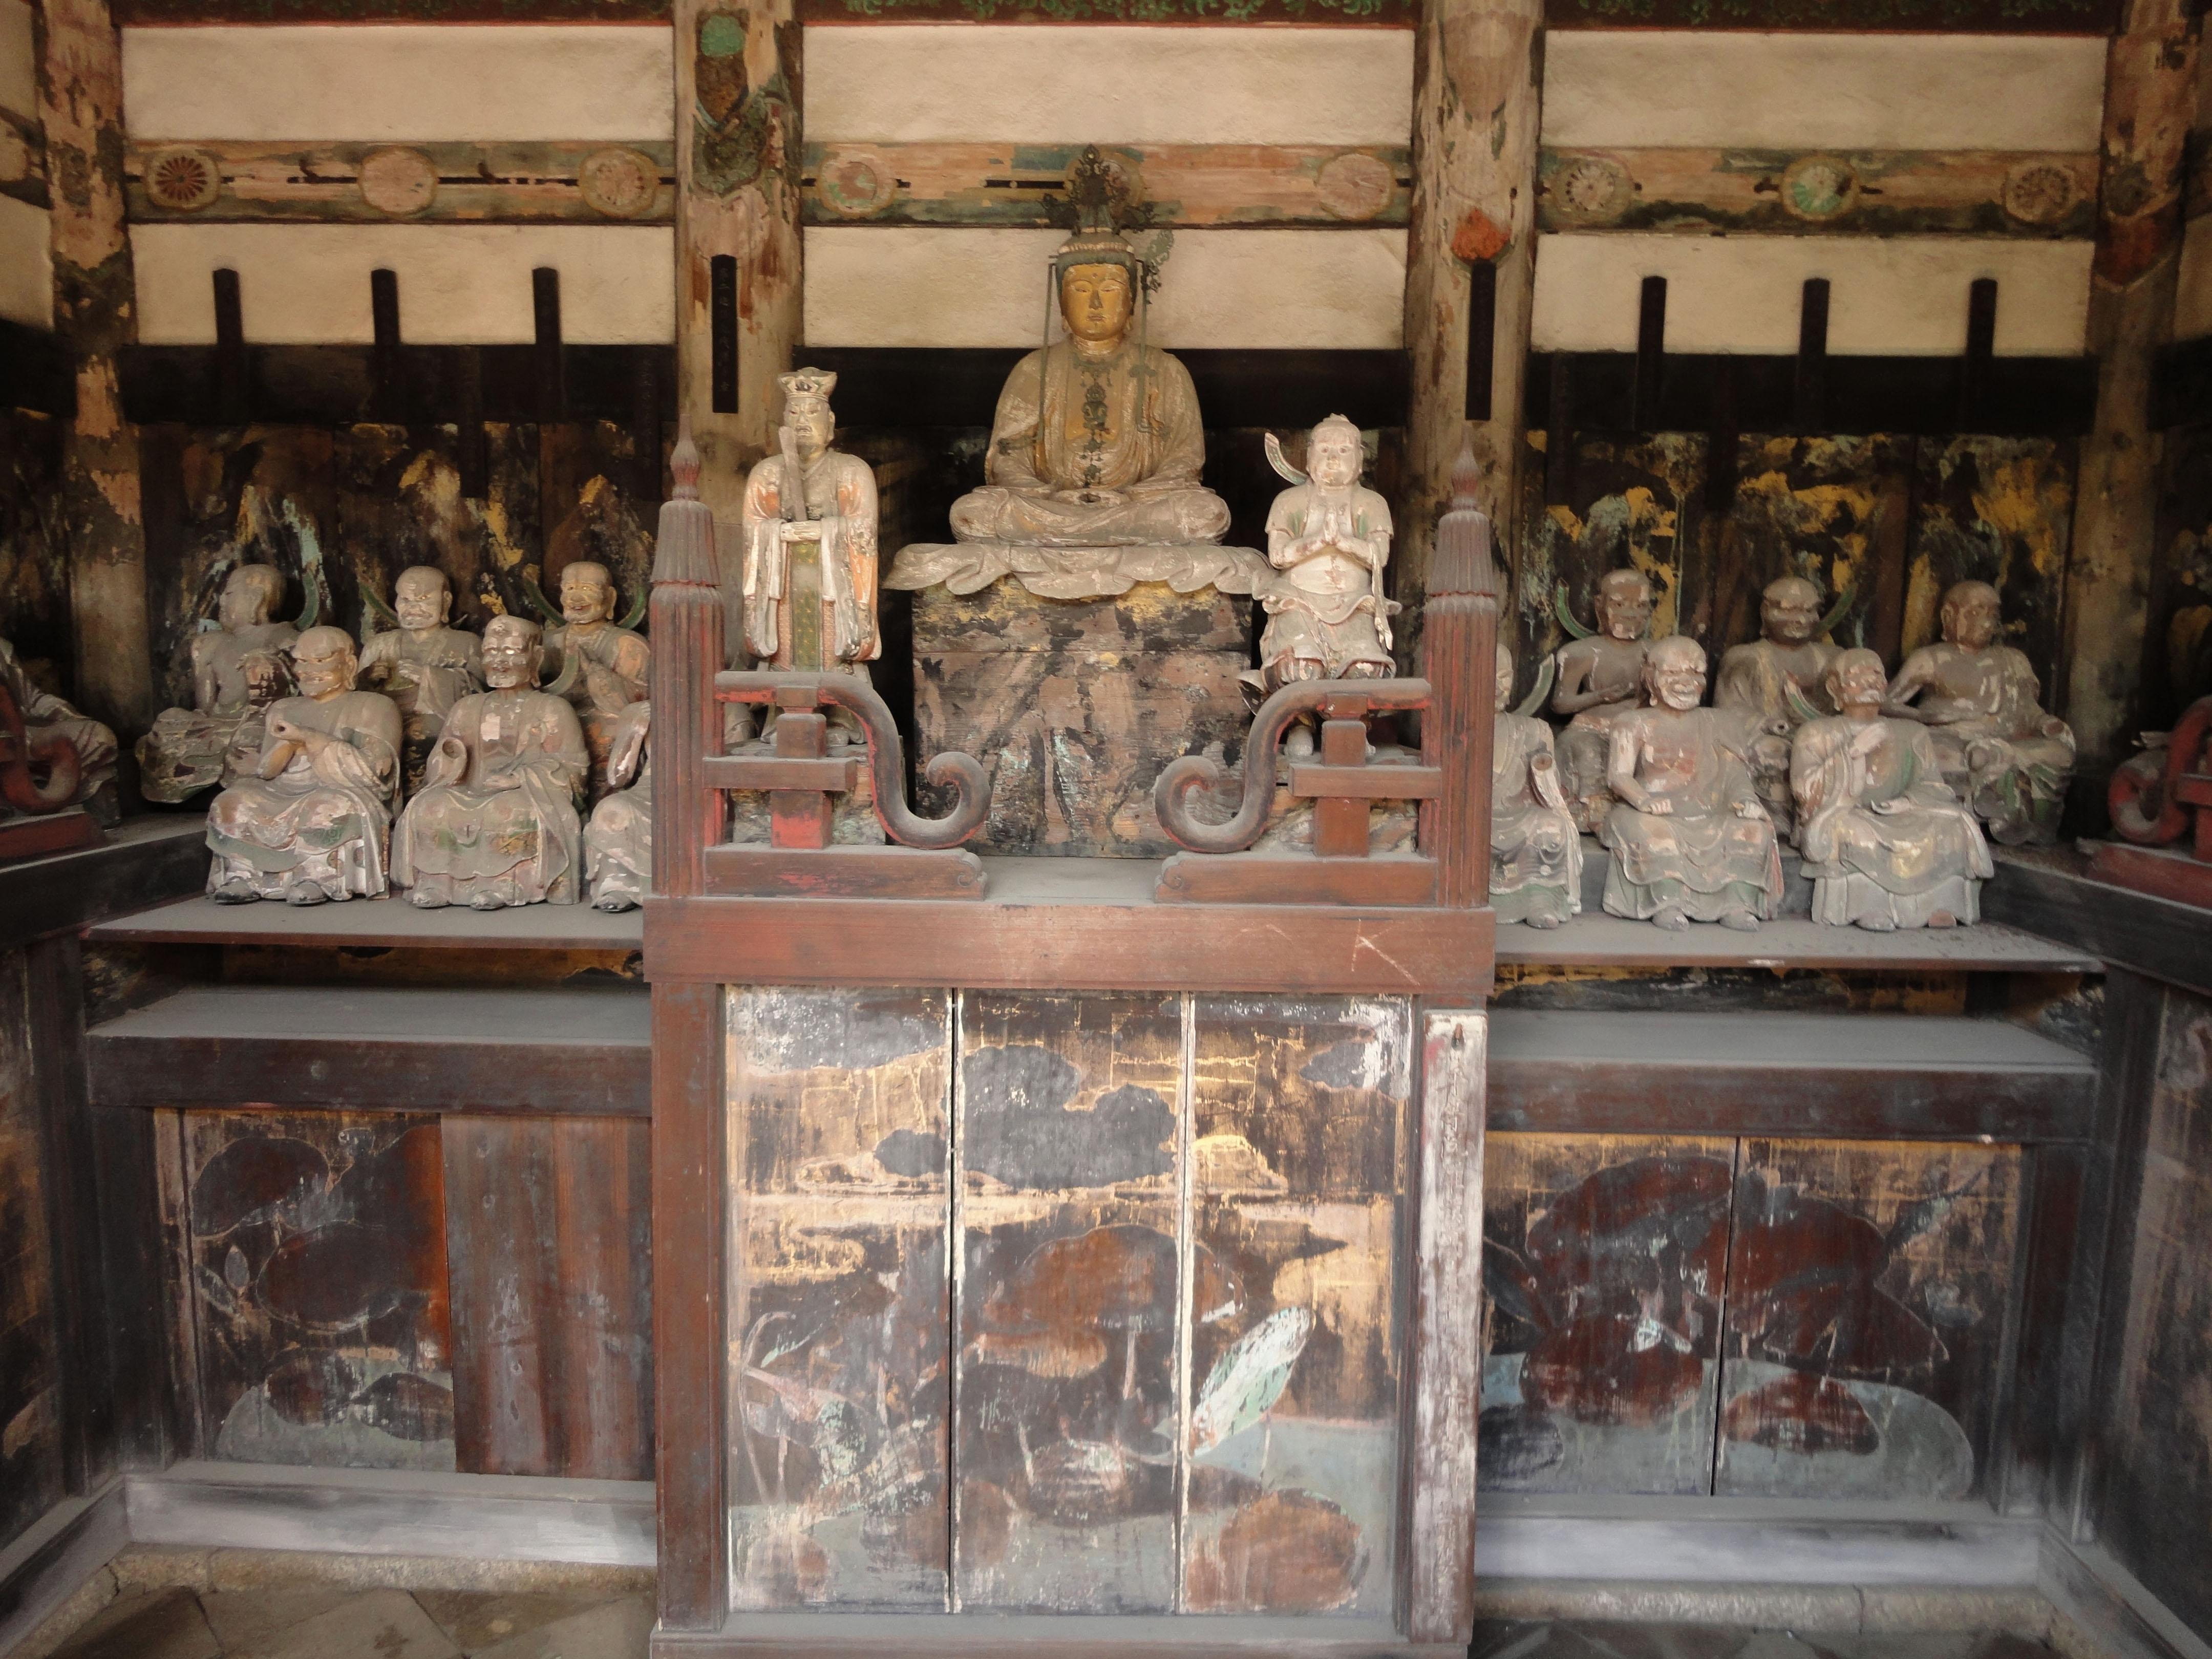 Byodo in Buddhist temple Kannondo Buddhist shrines Mar 2010 01